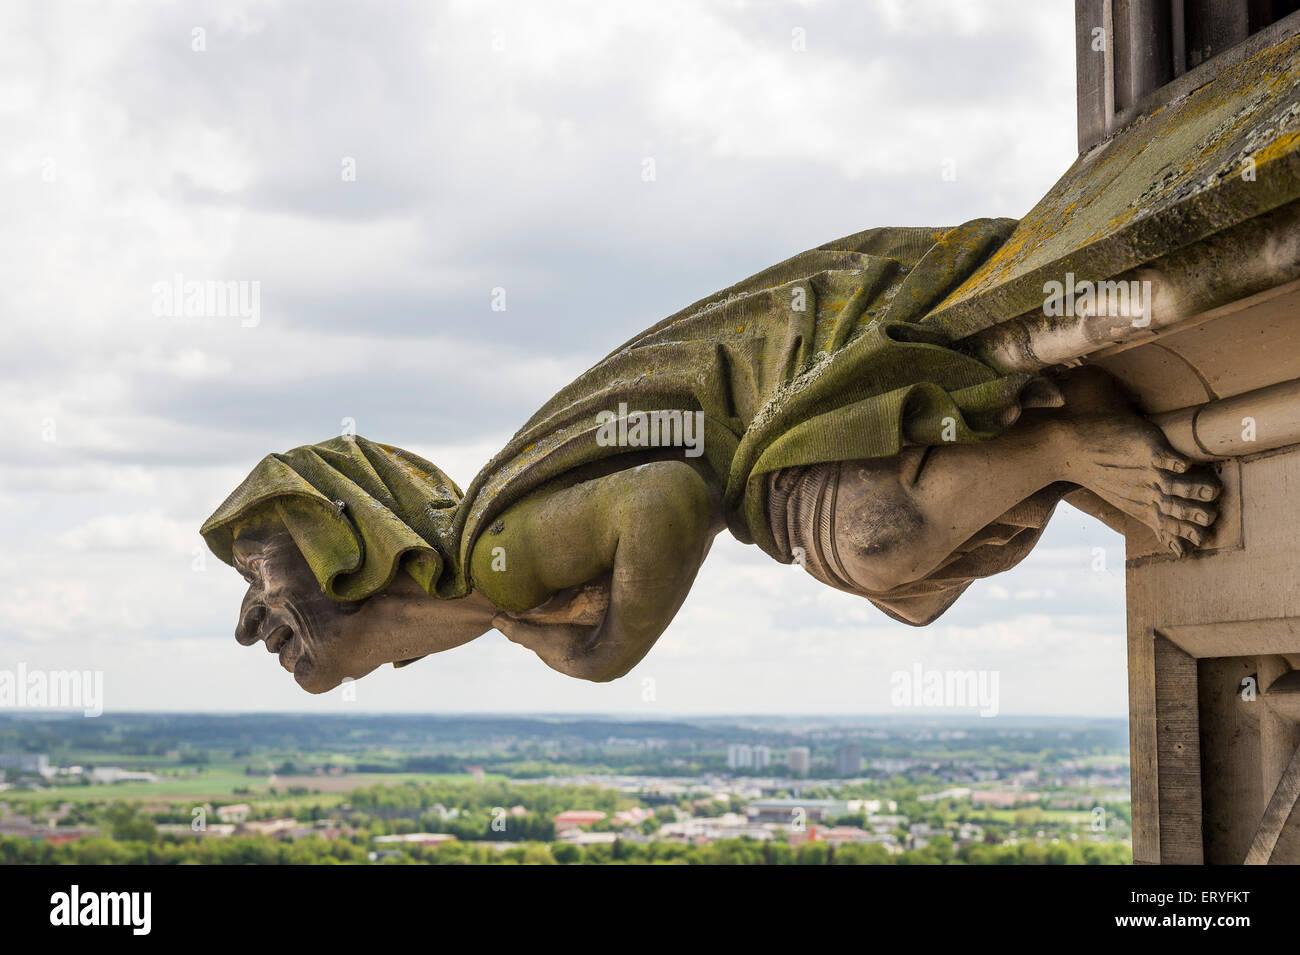 Gargoyle, Ulm Minster, Ulm, Baden-Württemberg, Germany Stock Photo